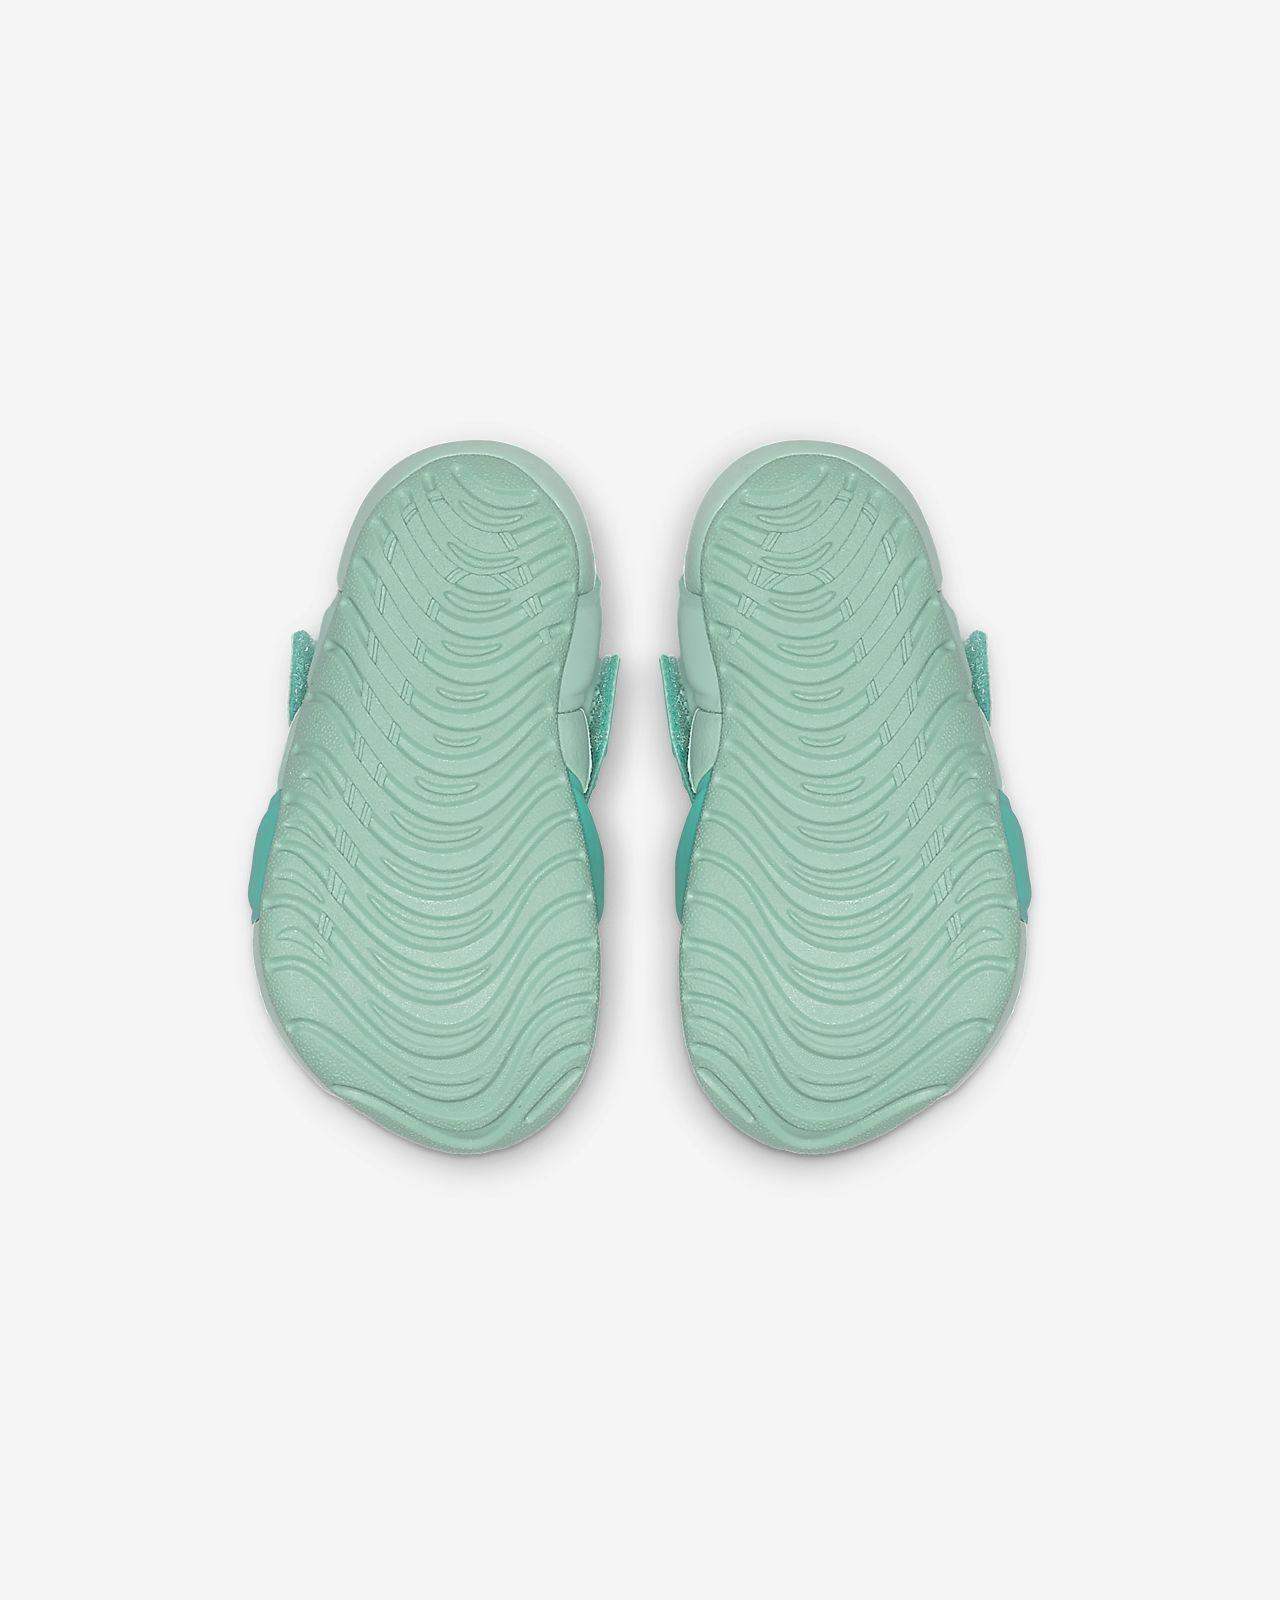 0bc10f05b Sandalia Nike Sunray Protect 2 para bebés   niños pequeños. Nike.com CL